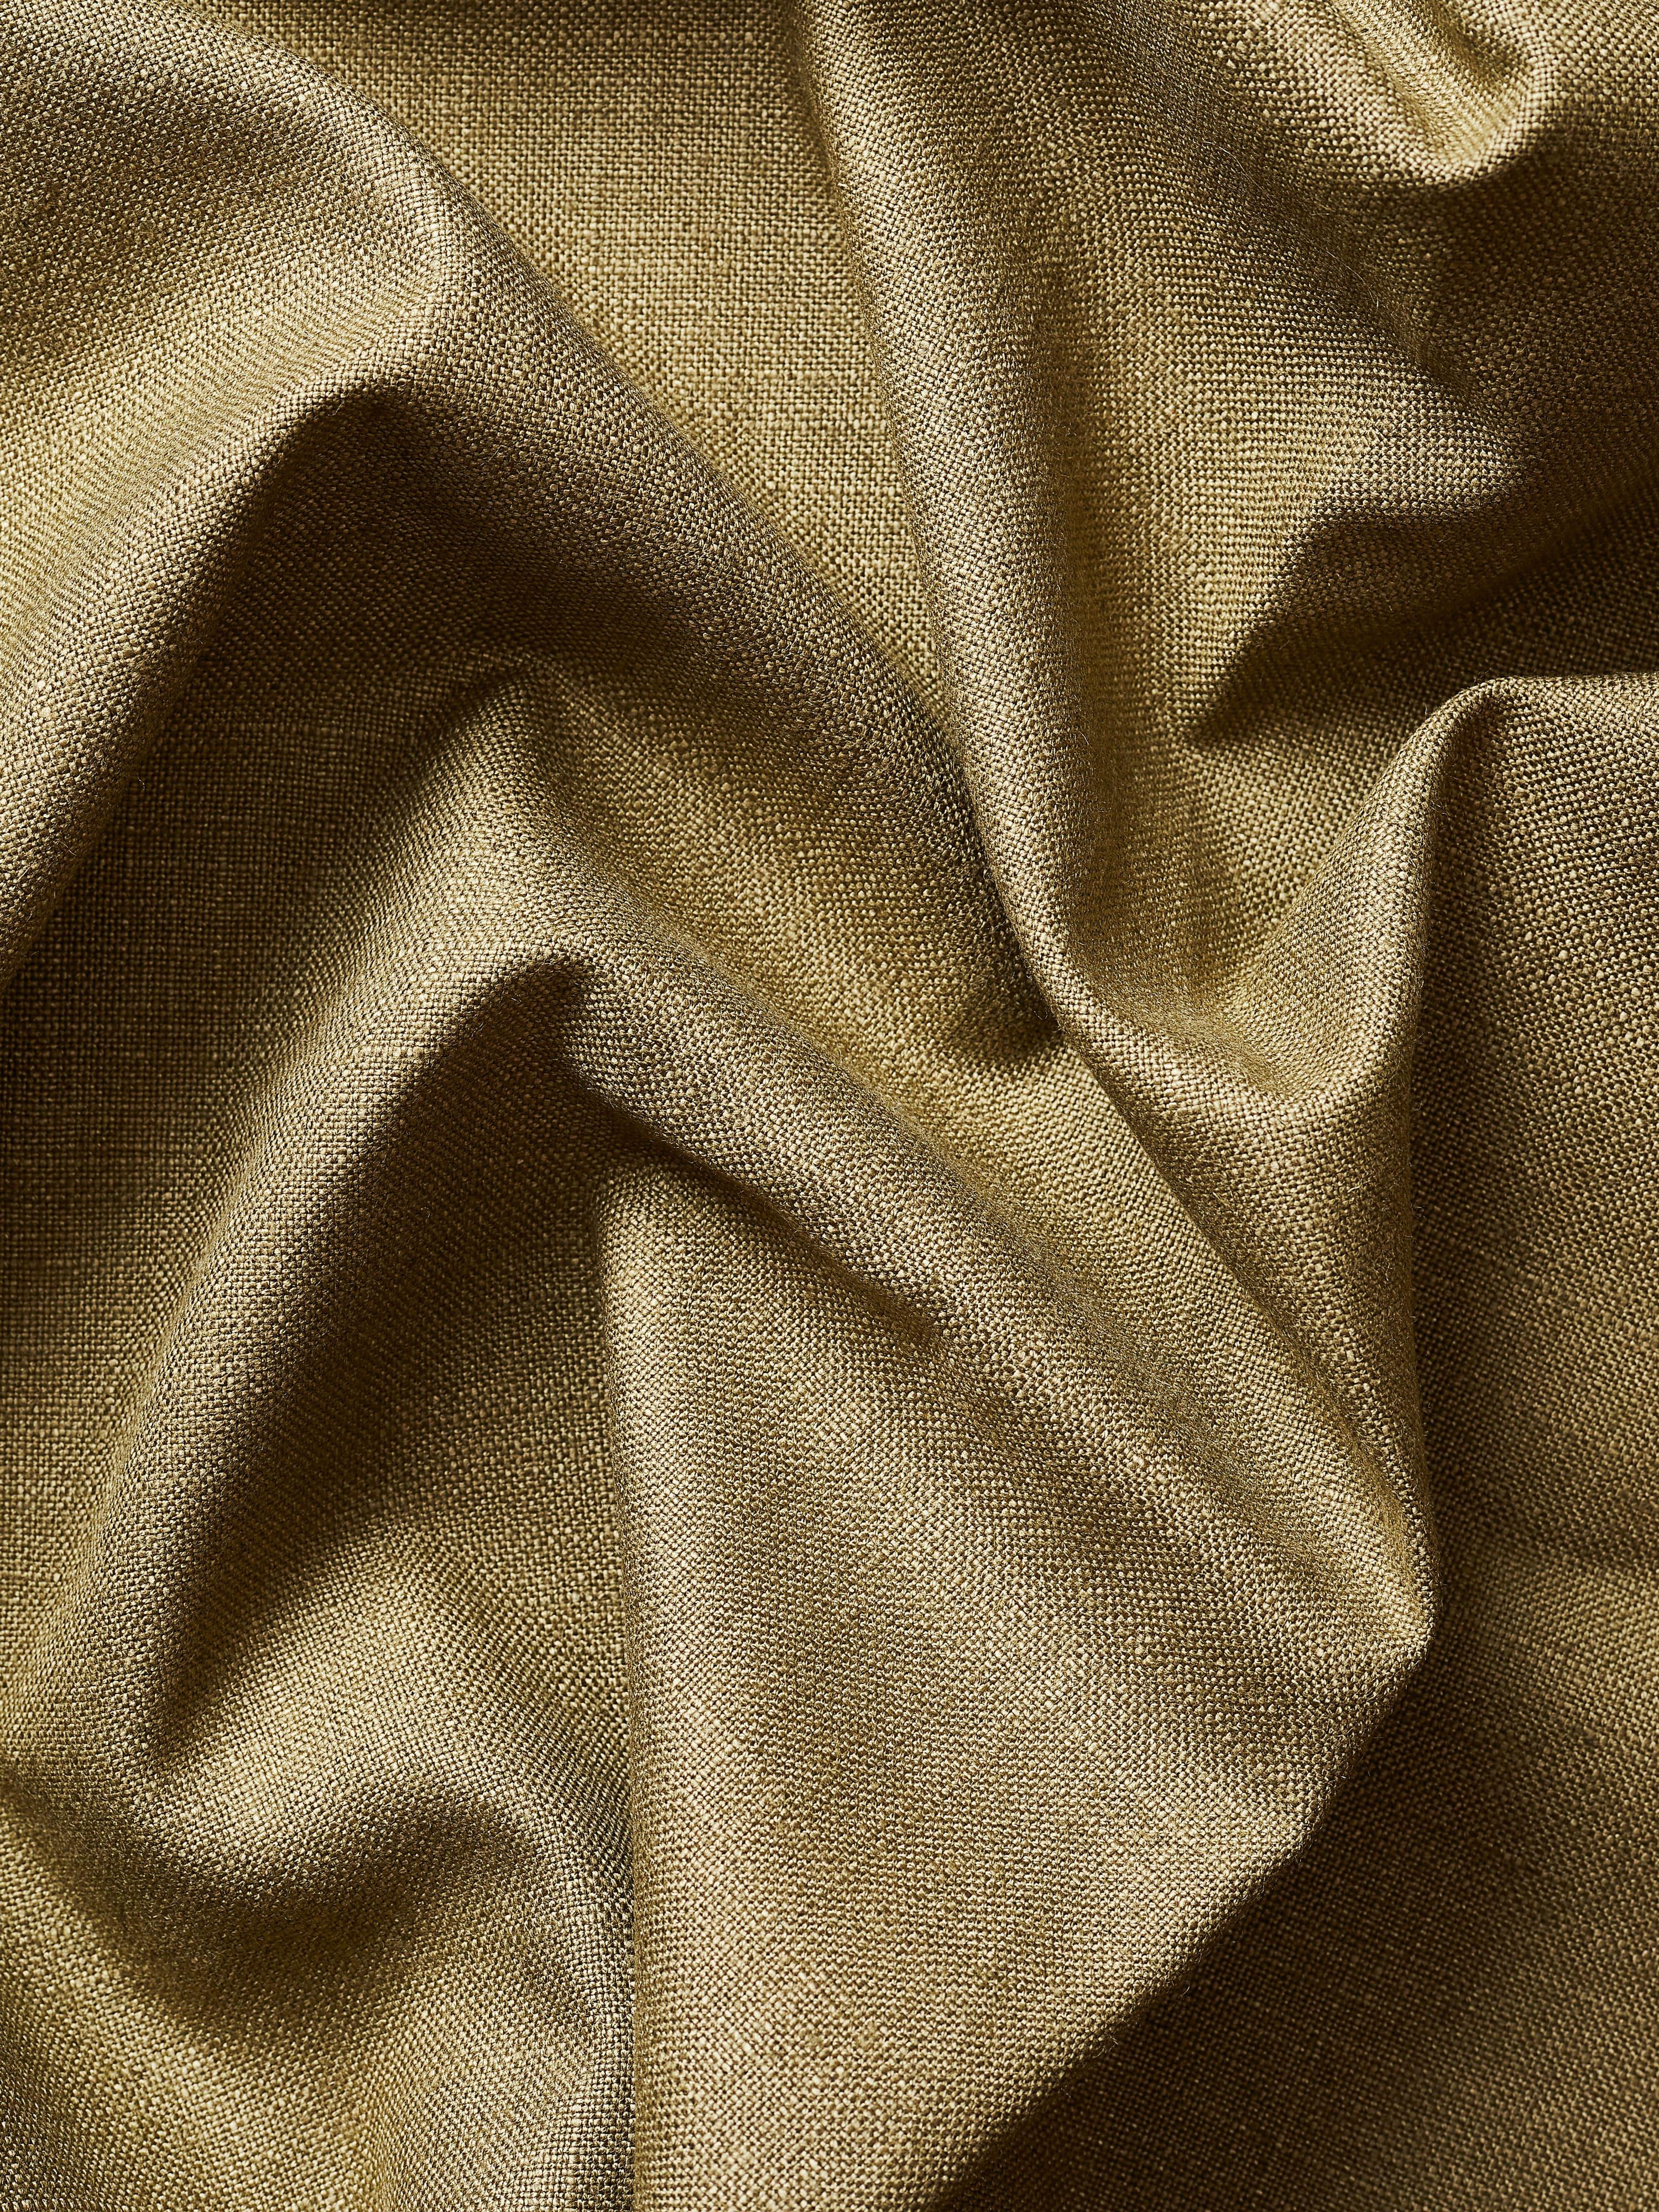 Two-Tone Fabric